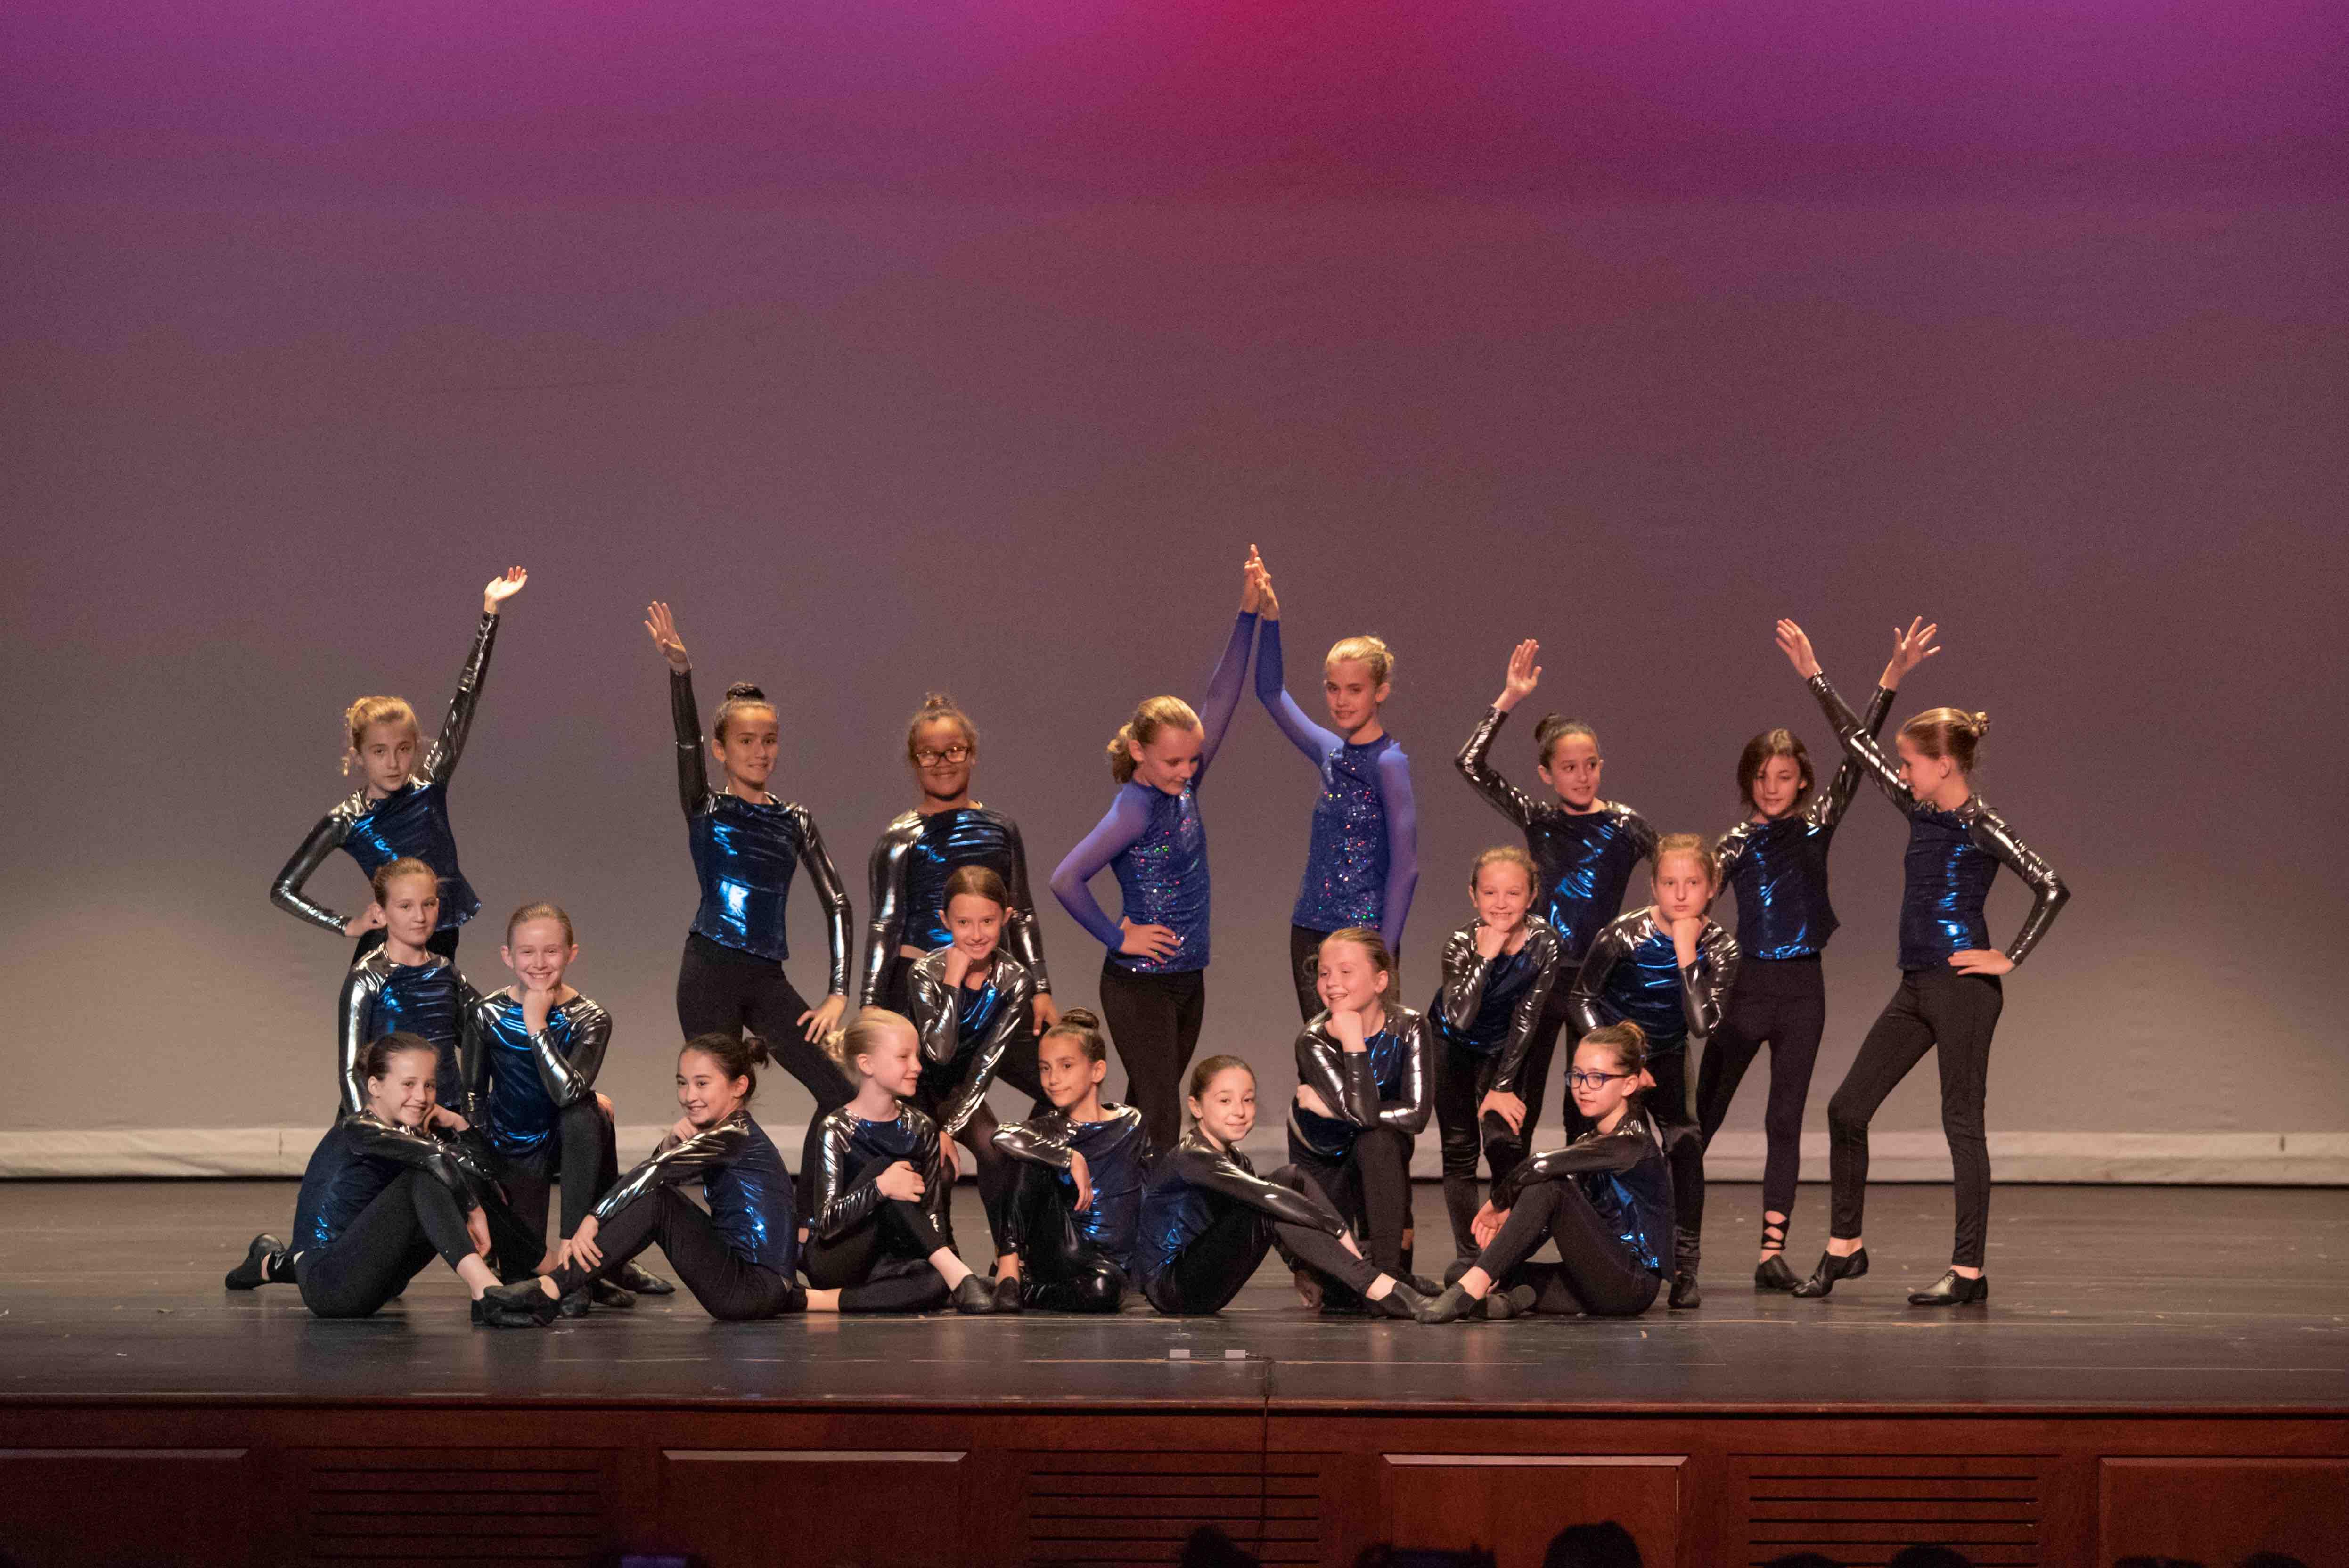 DanceWorks24